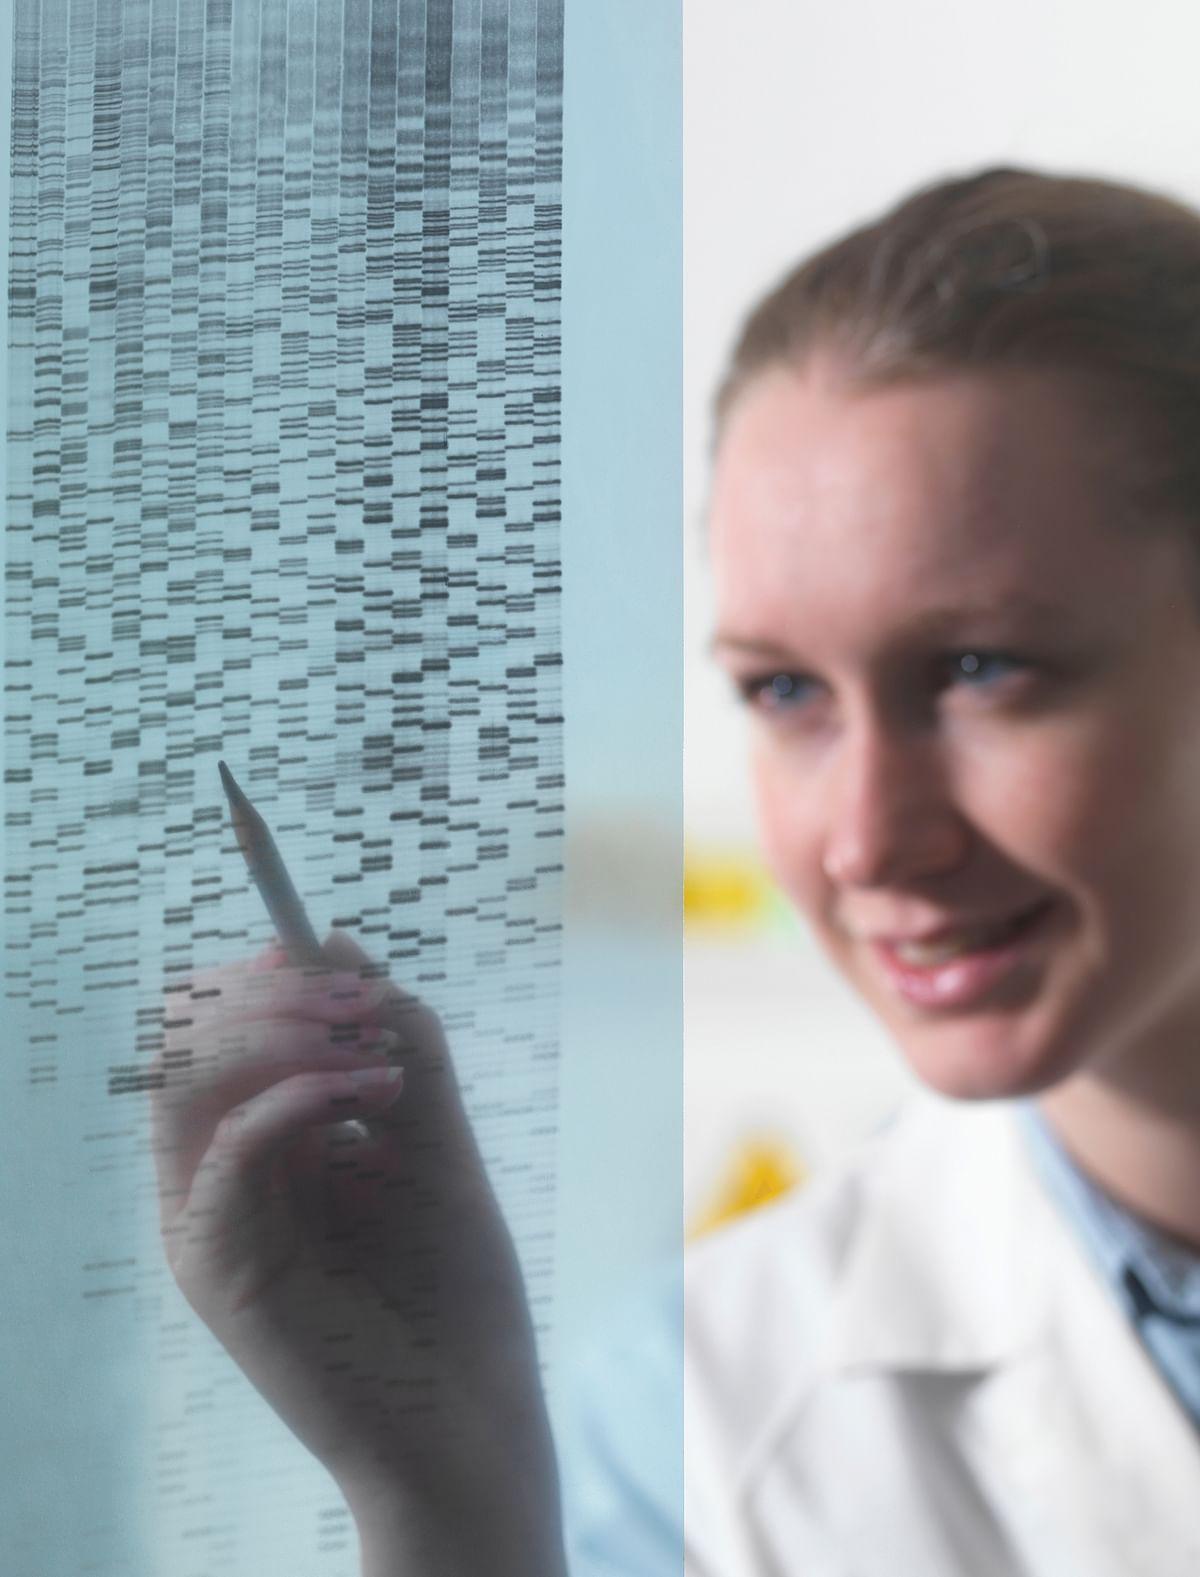 Female researcher examining DNA autoradiogram gel in laboratory